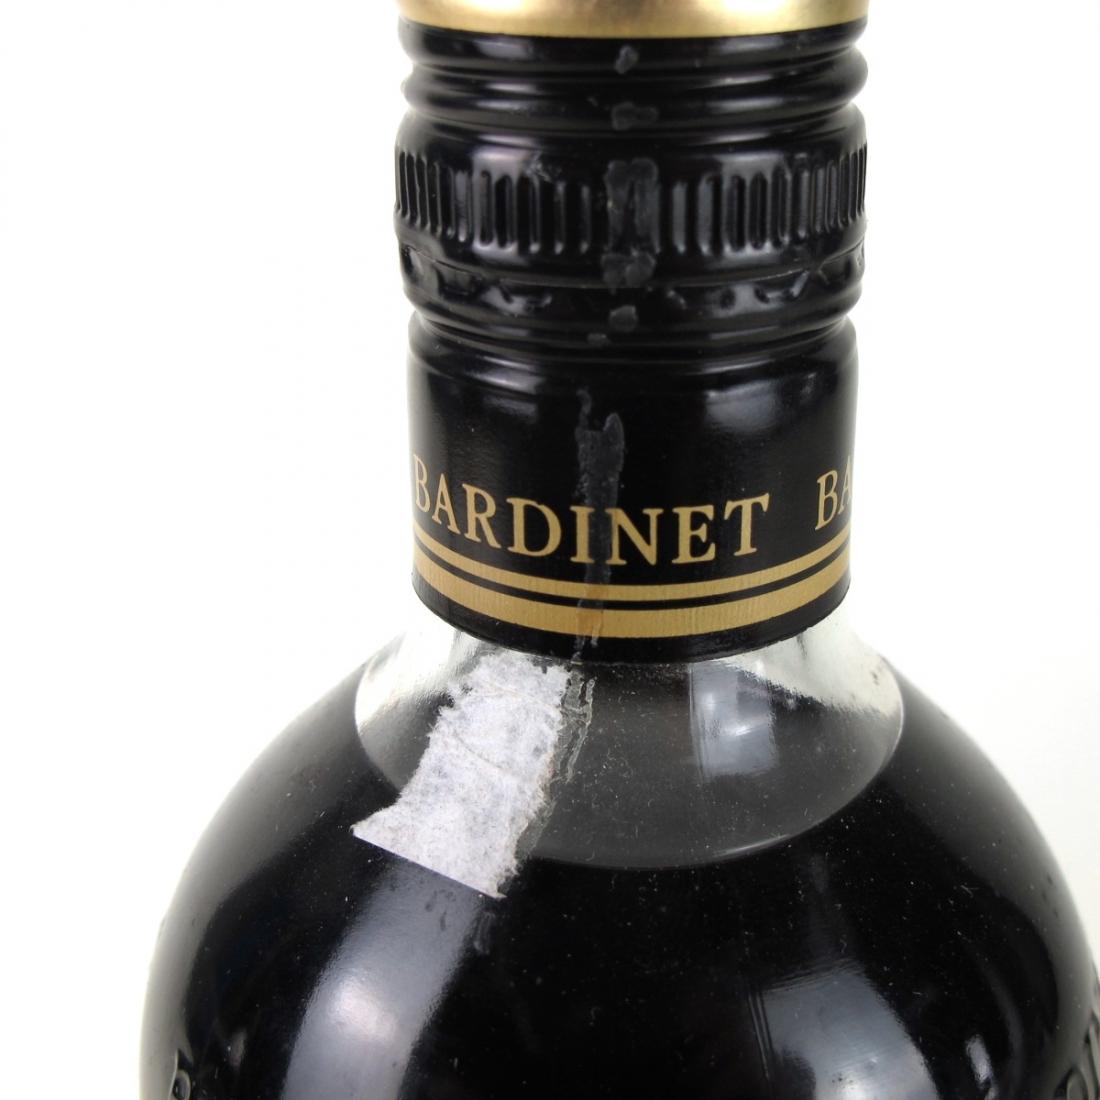 Bardinet Cassis